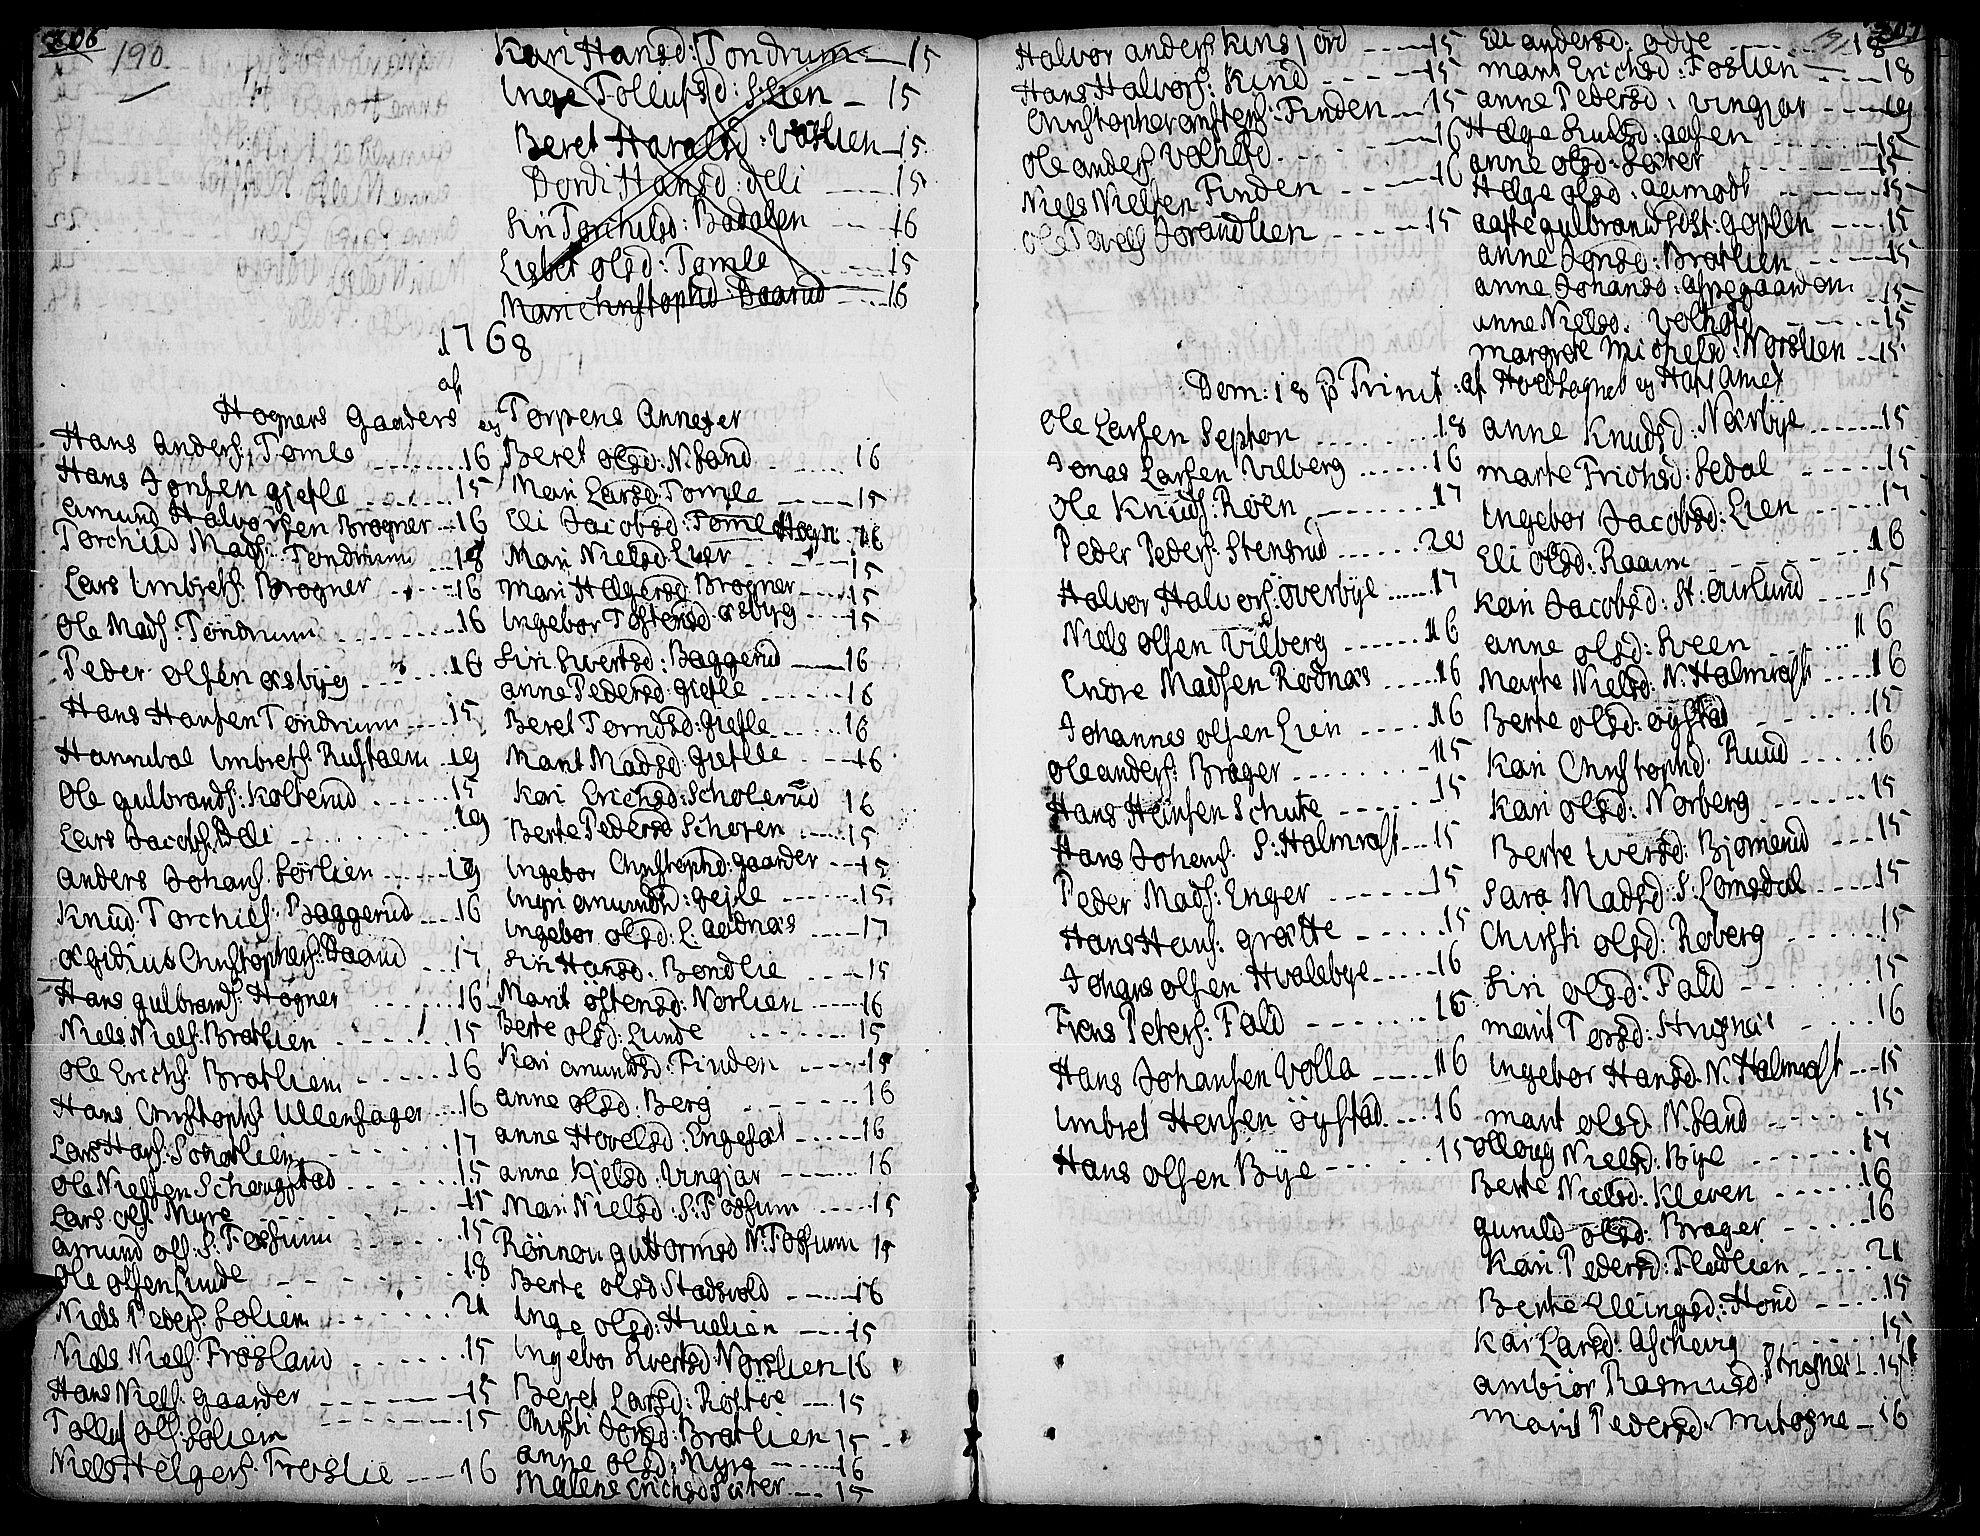 SAH, Land prestekontor, Ministerialbok nr. 5, 1765-1784, s. 190-191